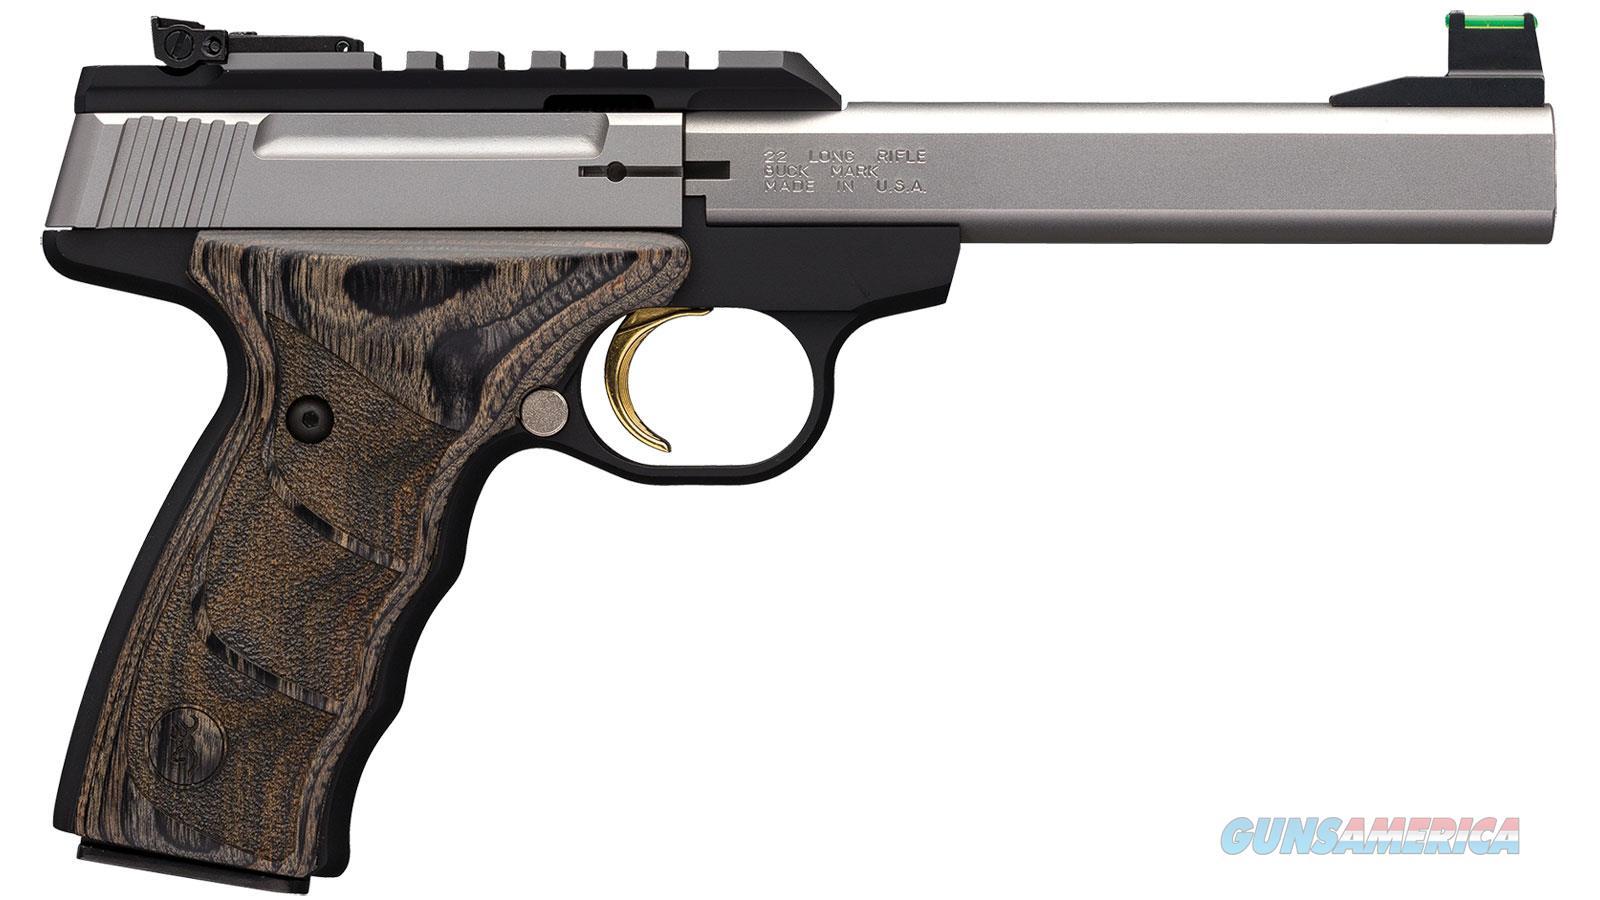 Browning Buck Mark Plus Ss Udx 22Lr 5.5 Fos 10Rd 051531490  Guns > Pistols > B Misc Pistols